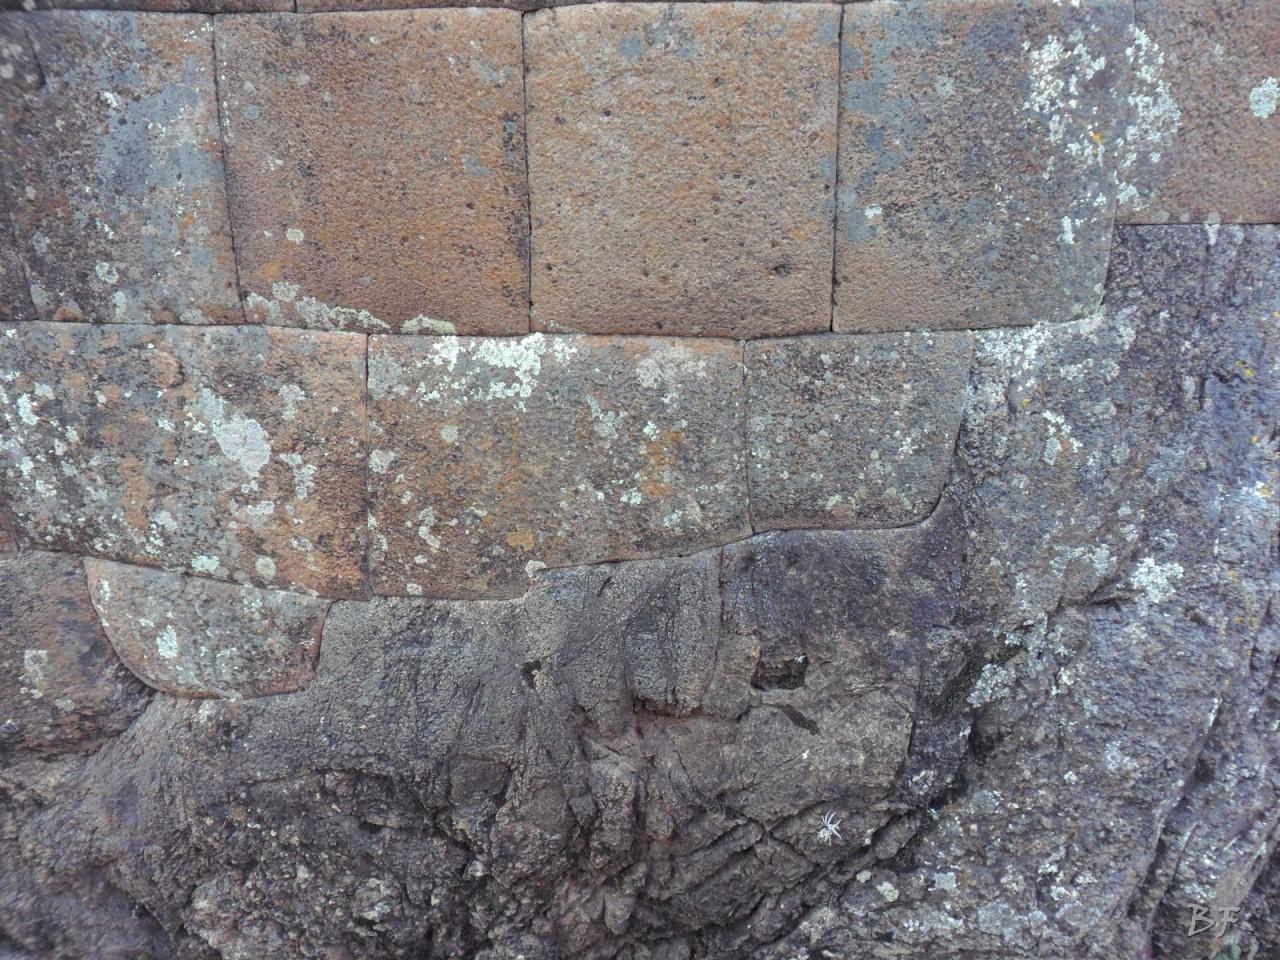 Mura-Poligonali-Megaliti-Altari-Rupestri-Pisac-Cusco-Perù-56